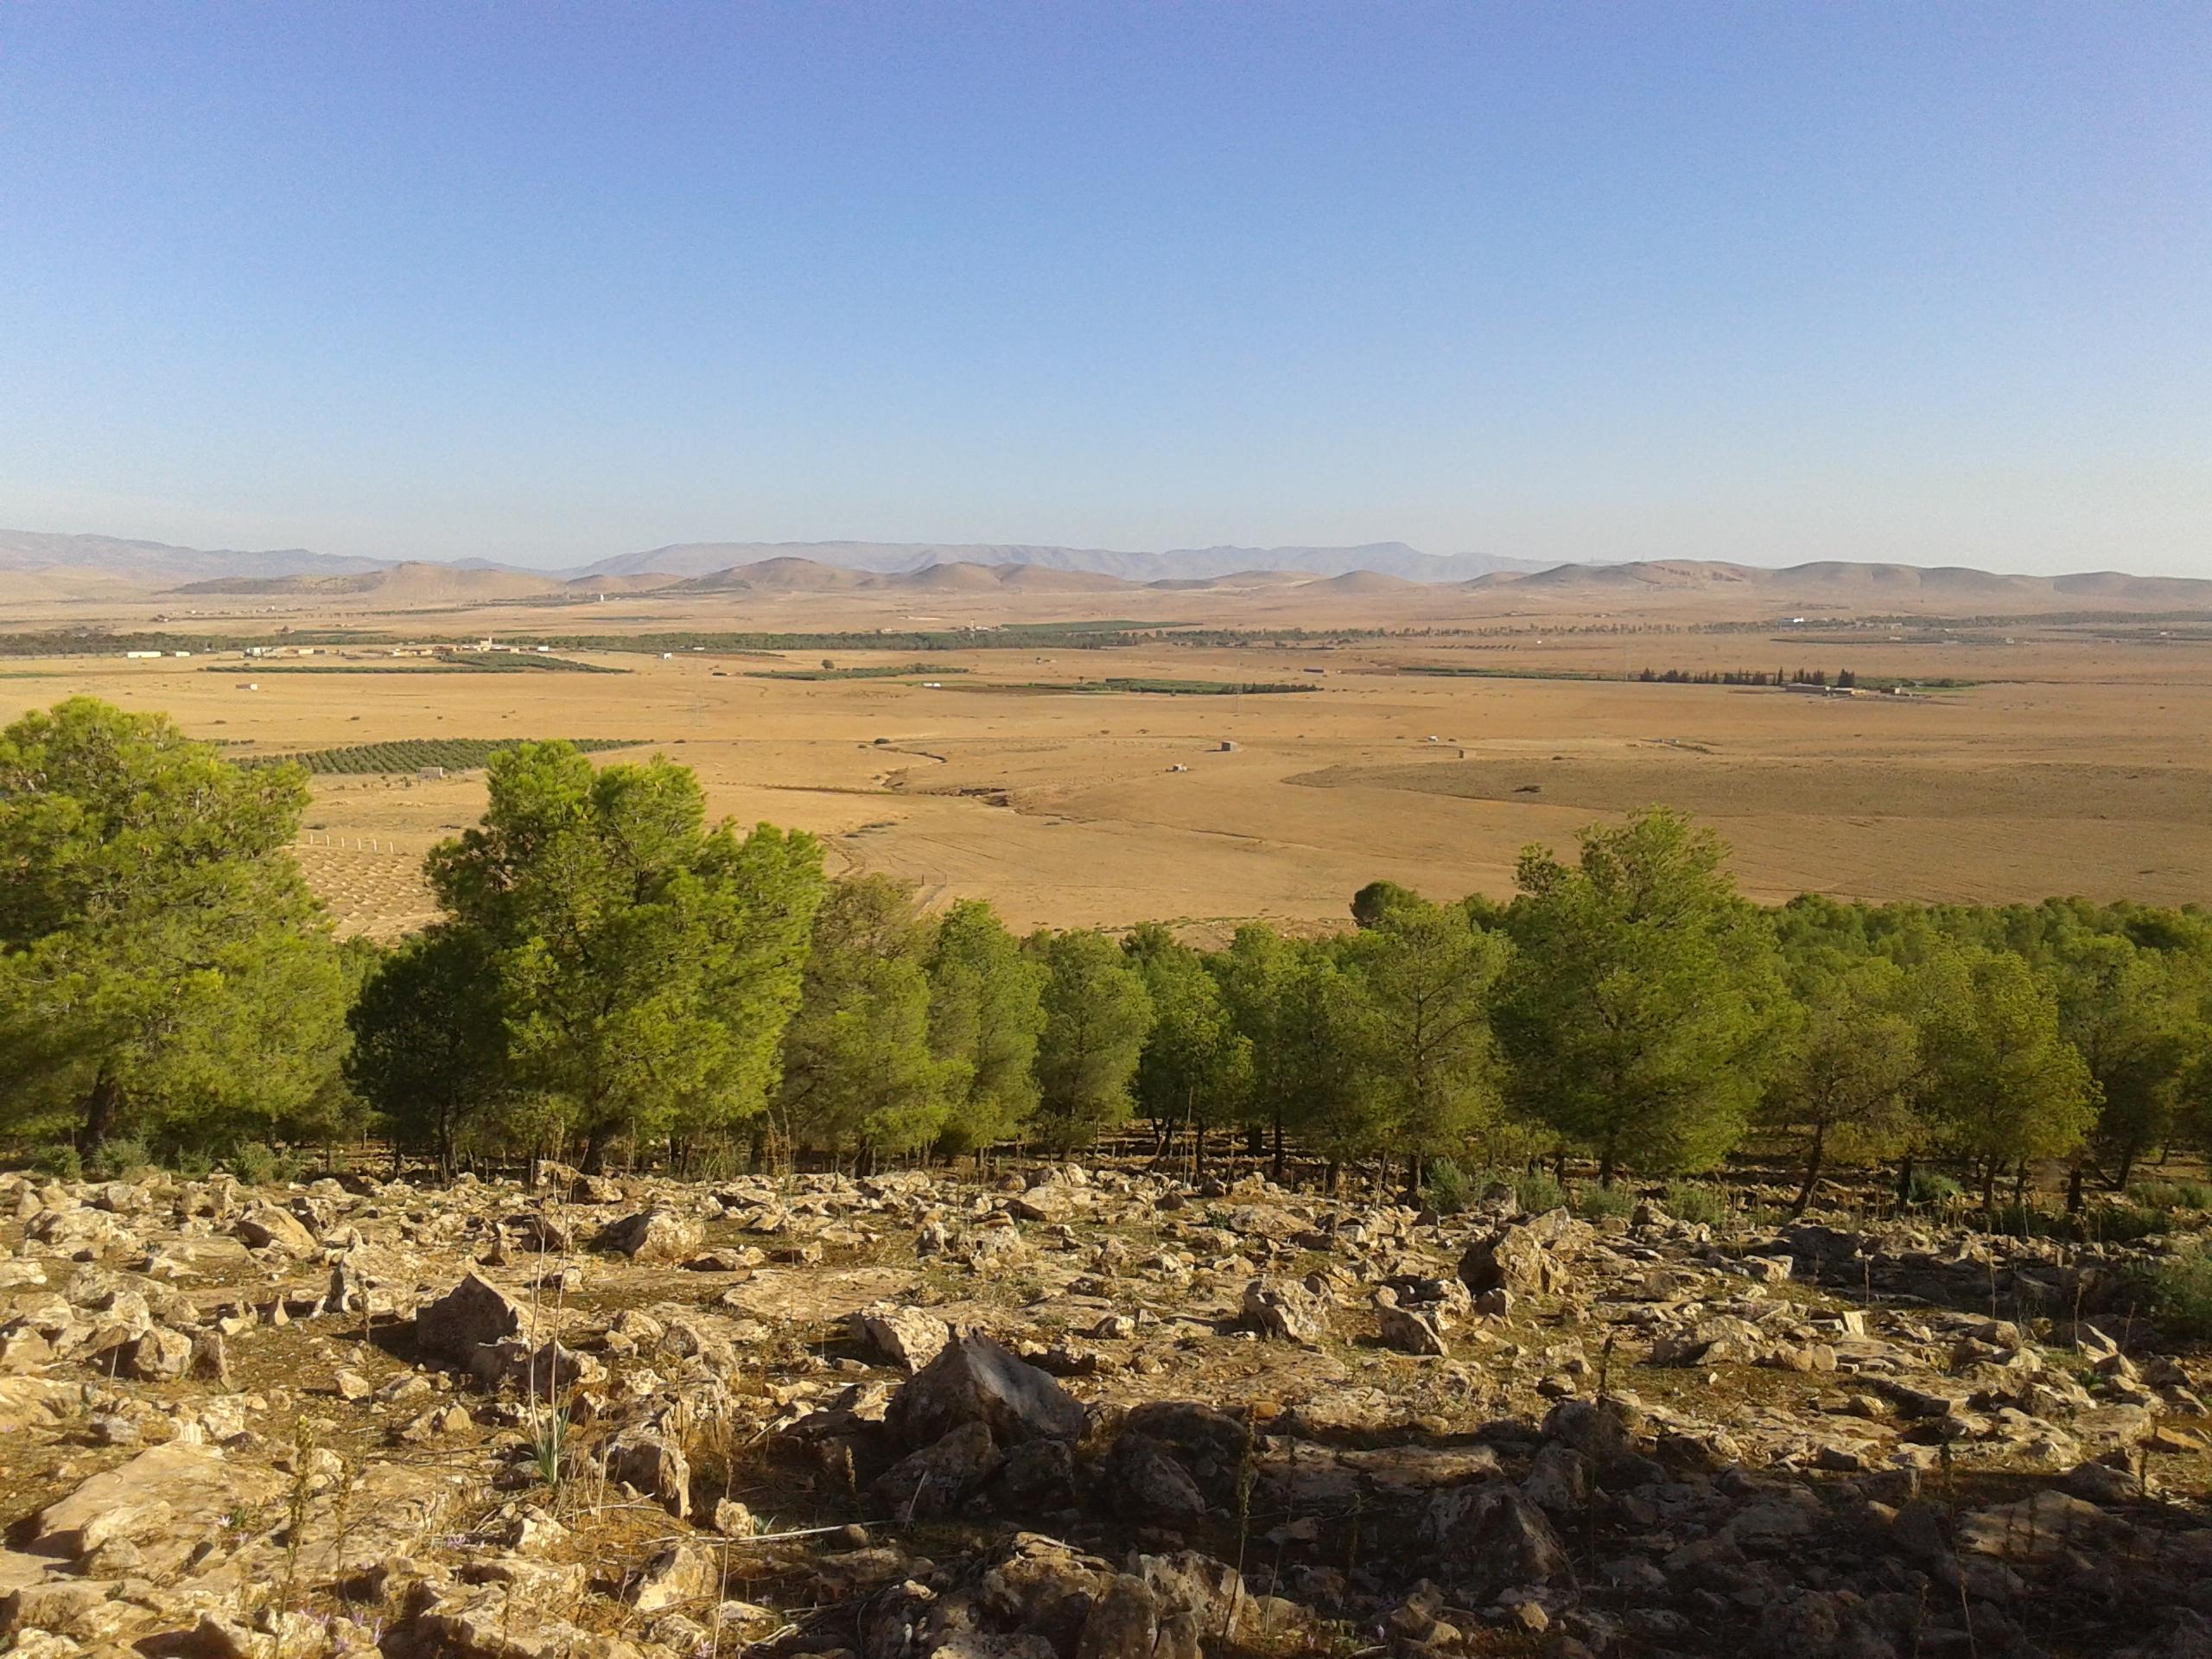 Fileصور مناظر طبيعية بضواحي مدينة العيون سيدي ملوكjpg